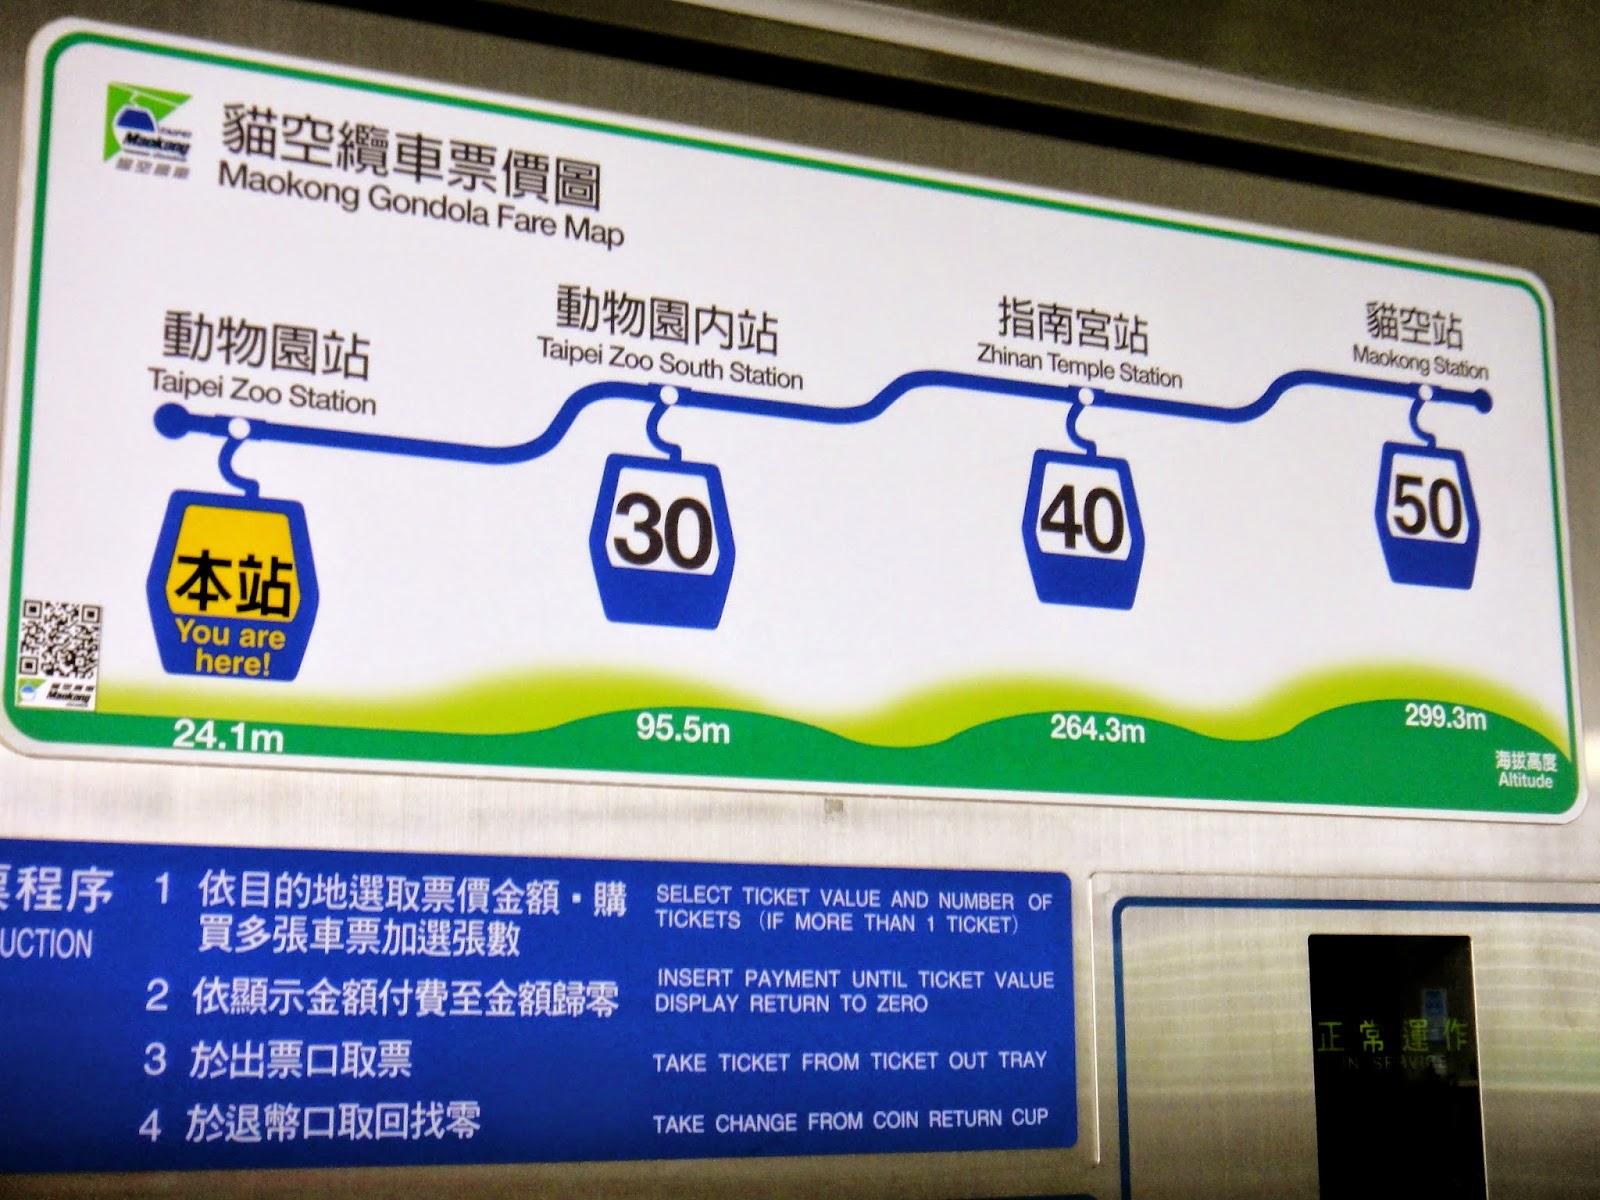 Maokong Gondola Fare Map